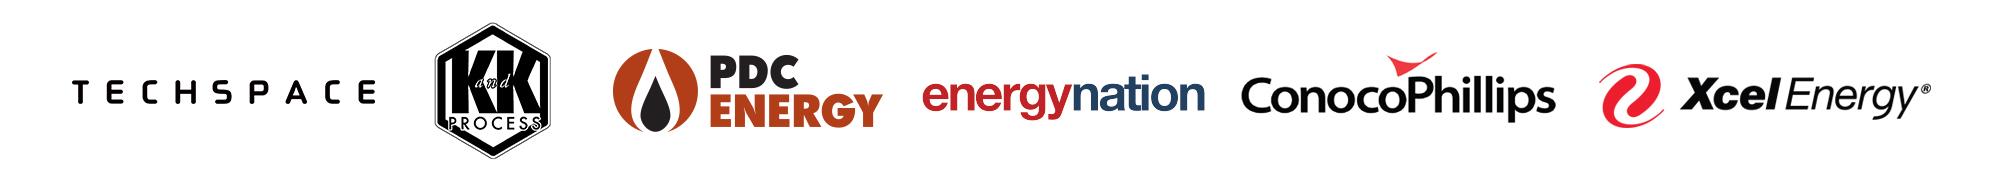 HERWorld Energy Forum 2019: SHIFT - HERWorld Energy Forum